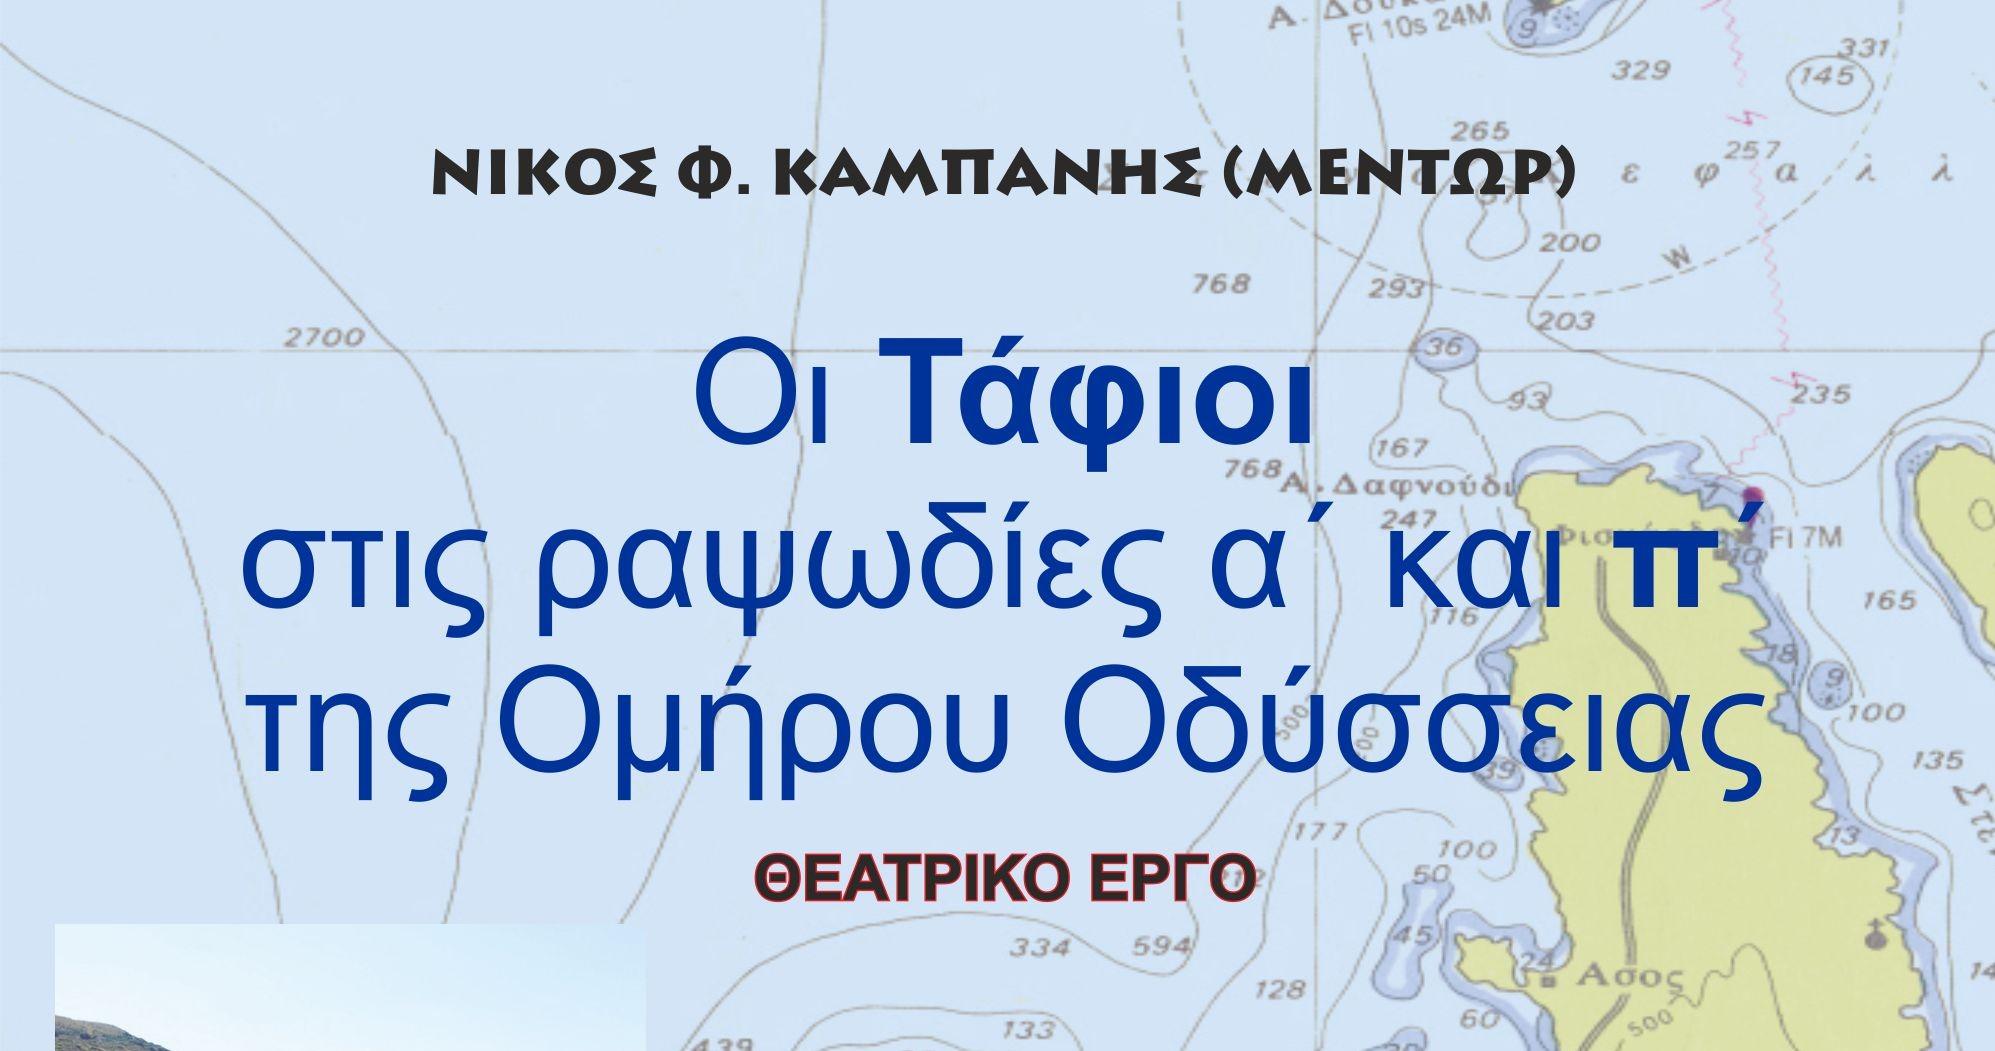 tafioi theatrical front (2).jpg